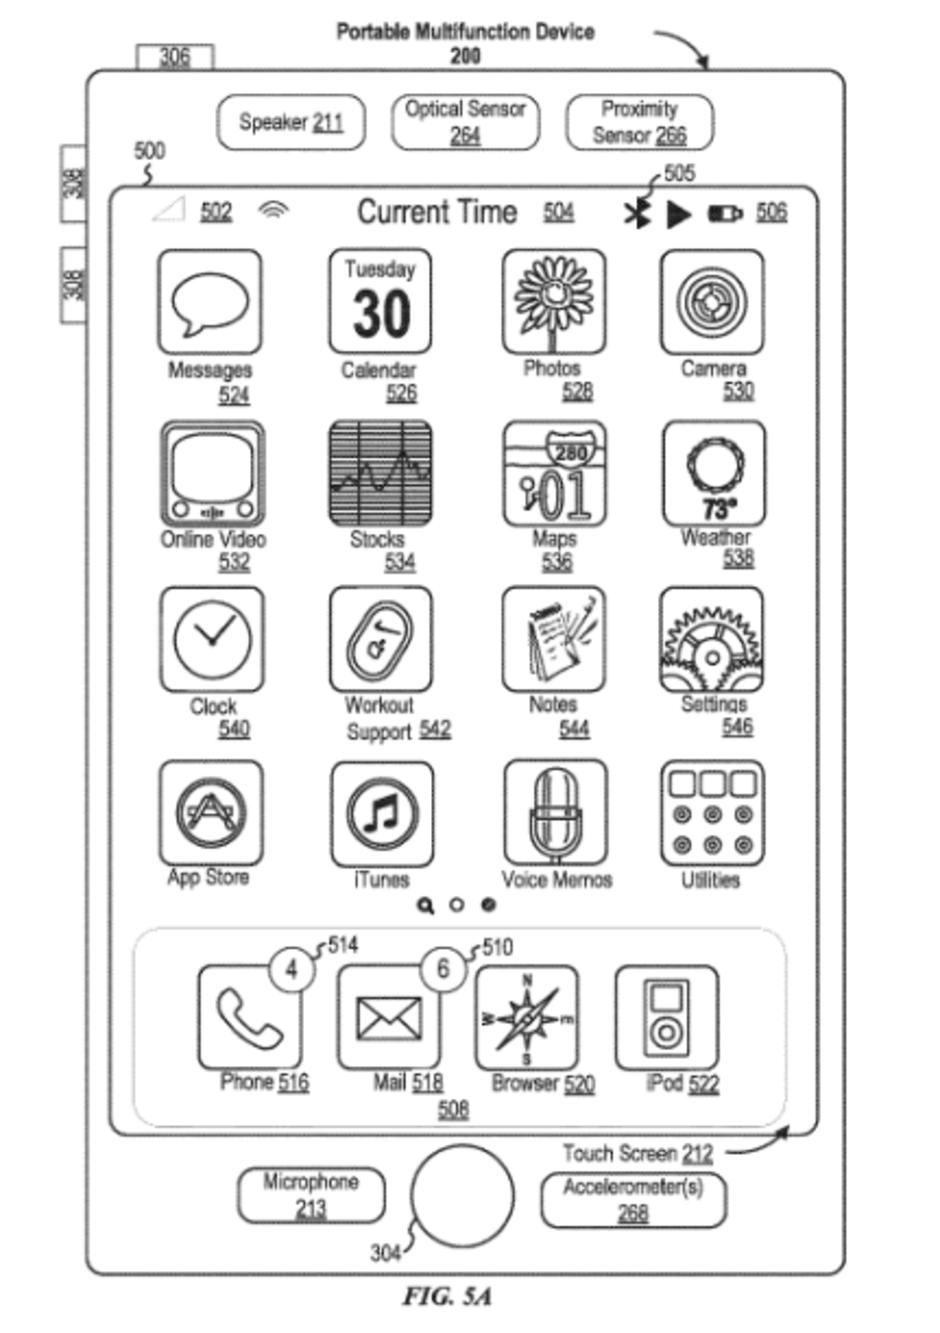 Mια νέα αίτηση διπλώματος ευρεσιτεχνίας της Apple αναφέρει ότι η Siri μπορεί να χειριστεί ορισμένες εργασίες ακόμη και εκτός σύνδεσης 1